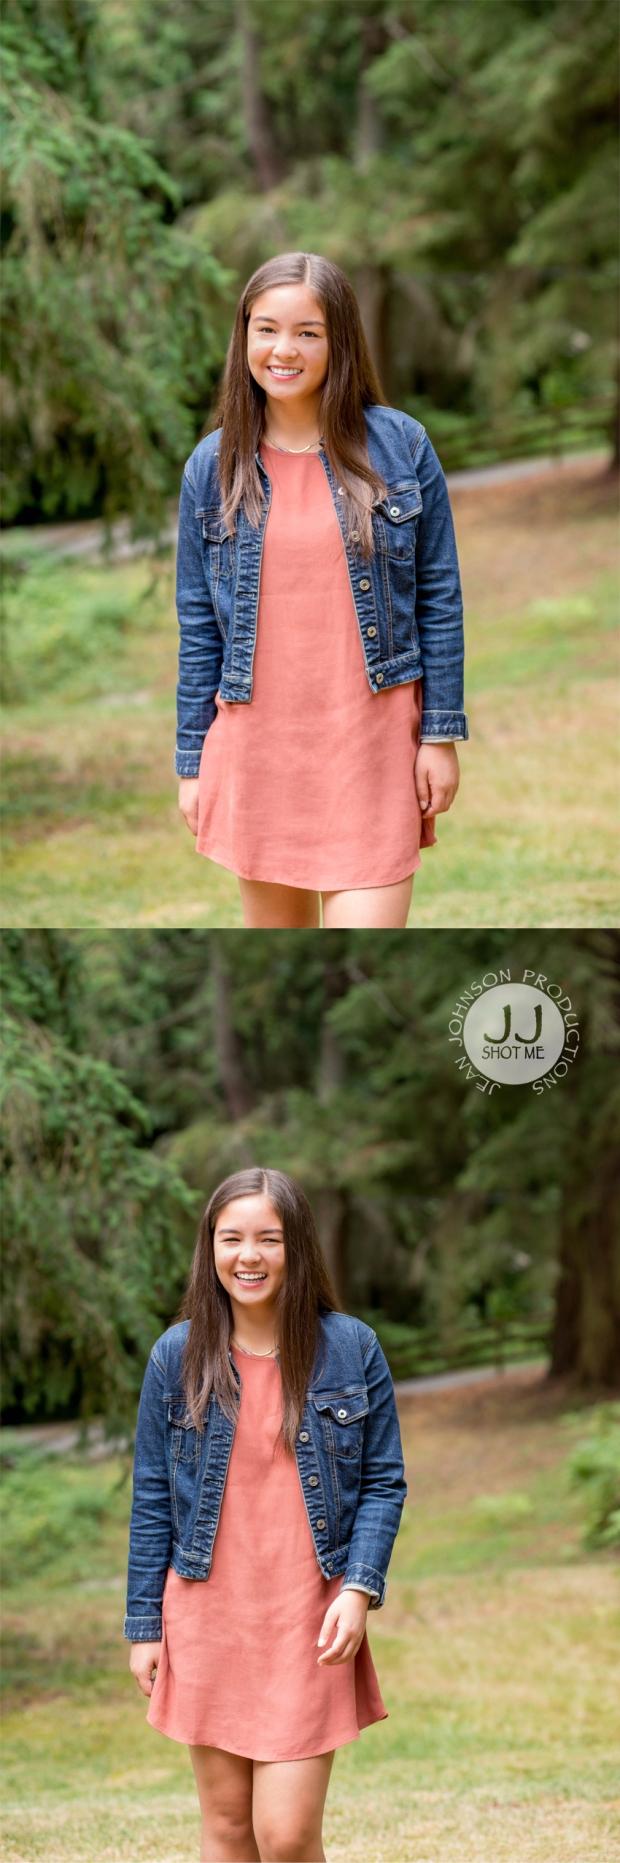 jjshotme-clare-pinkdress